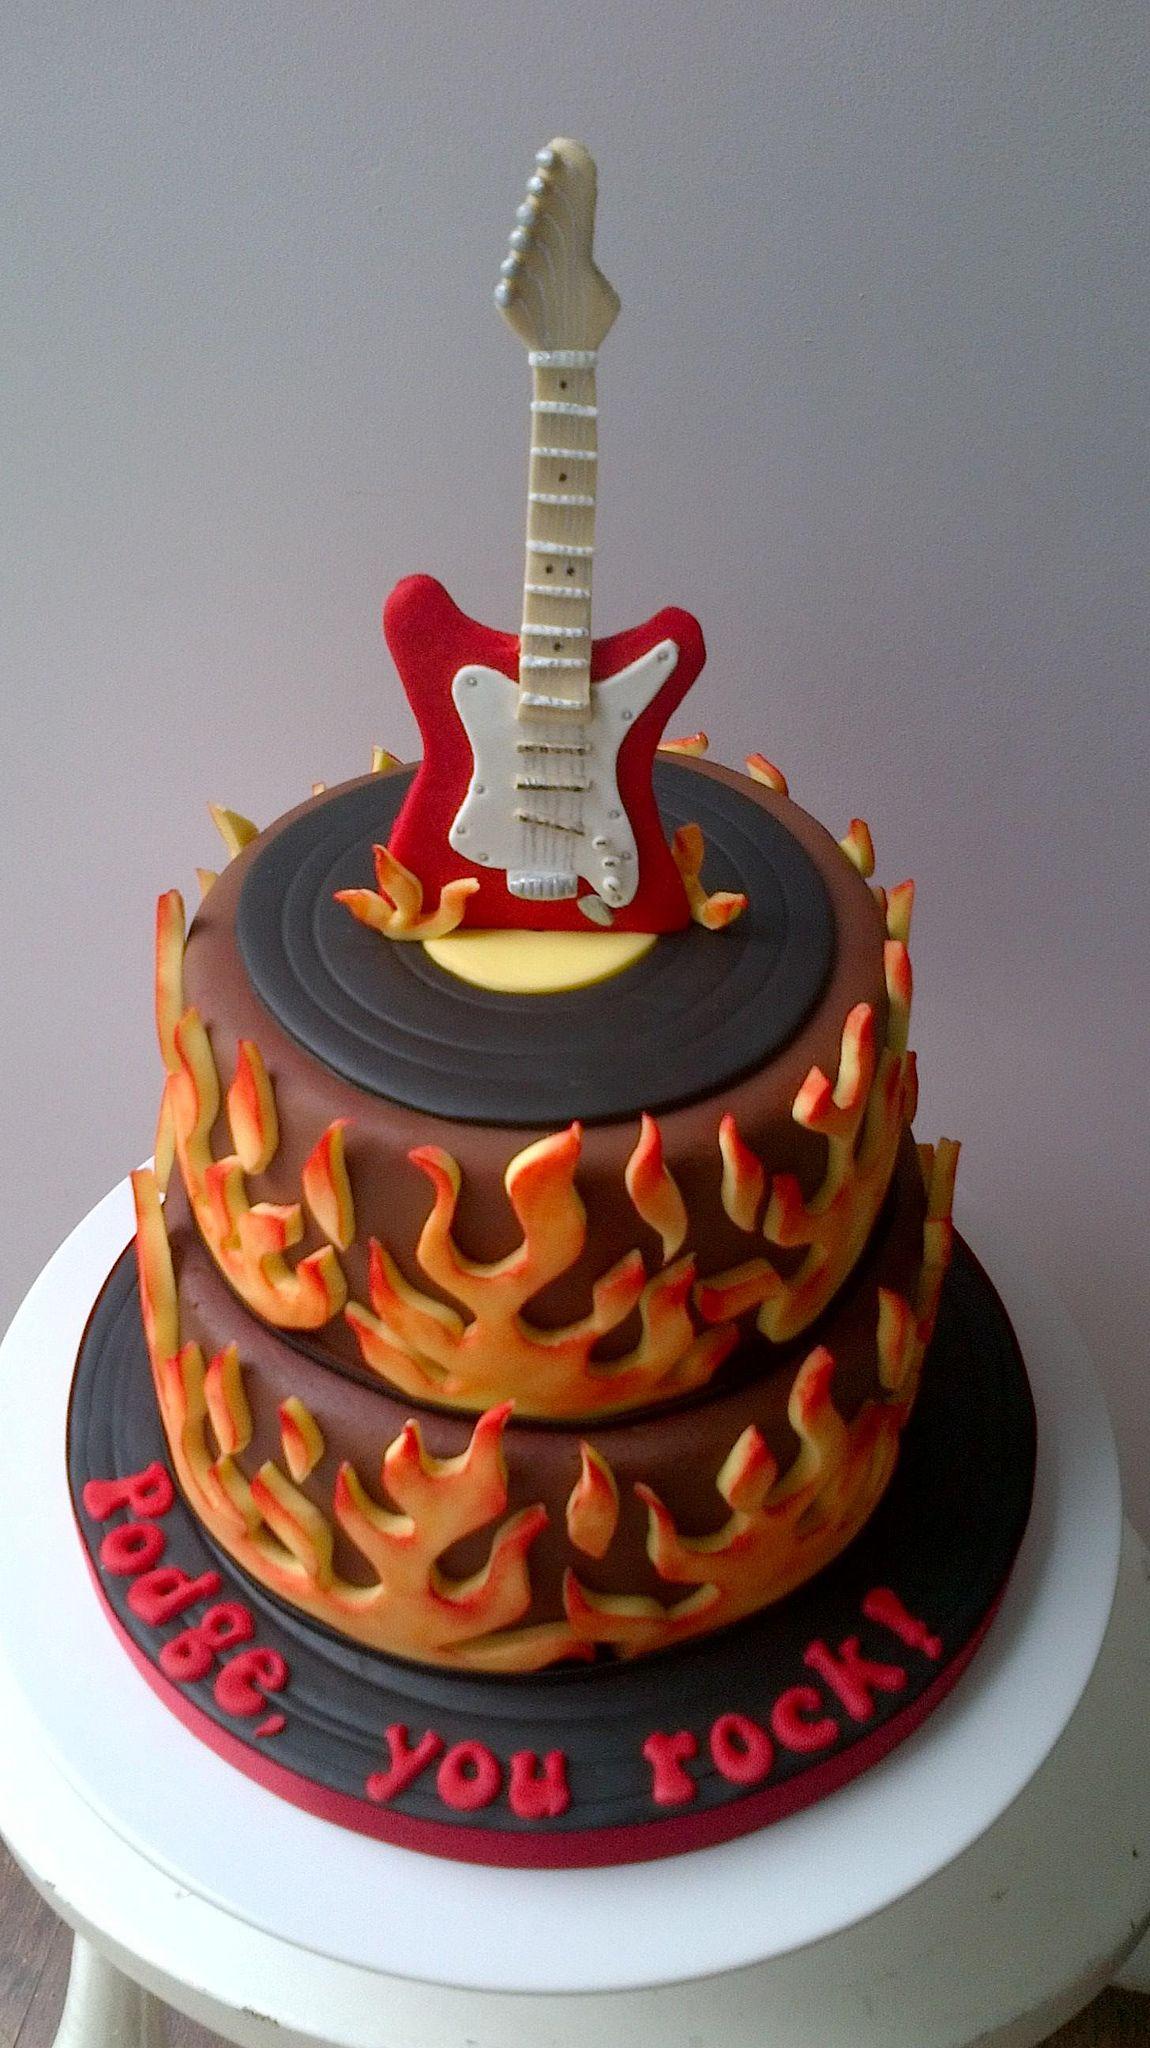 Electric Guitar Cake in 2020 Guitar cake, Music cakes